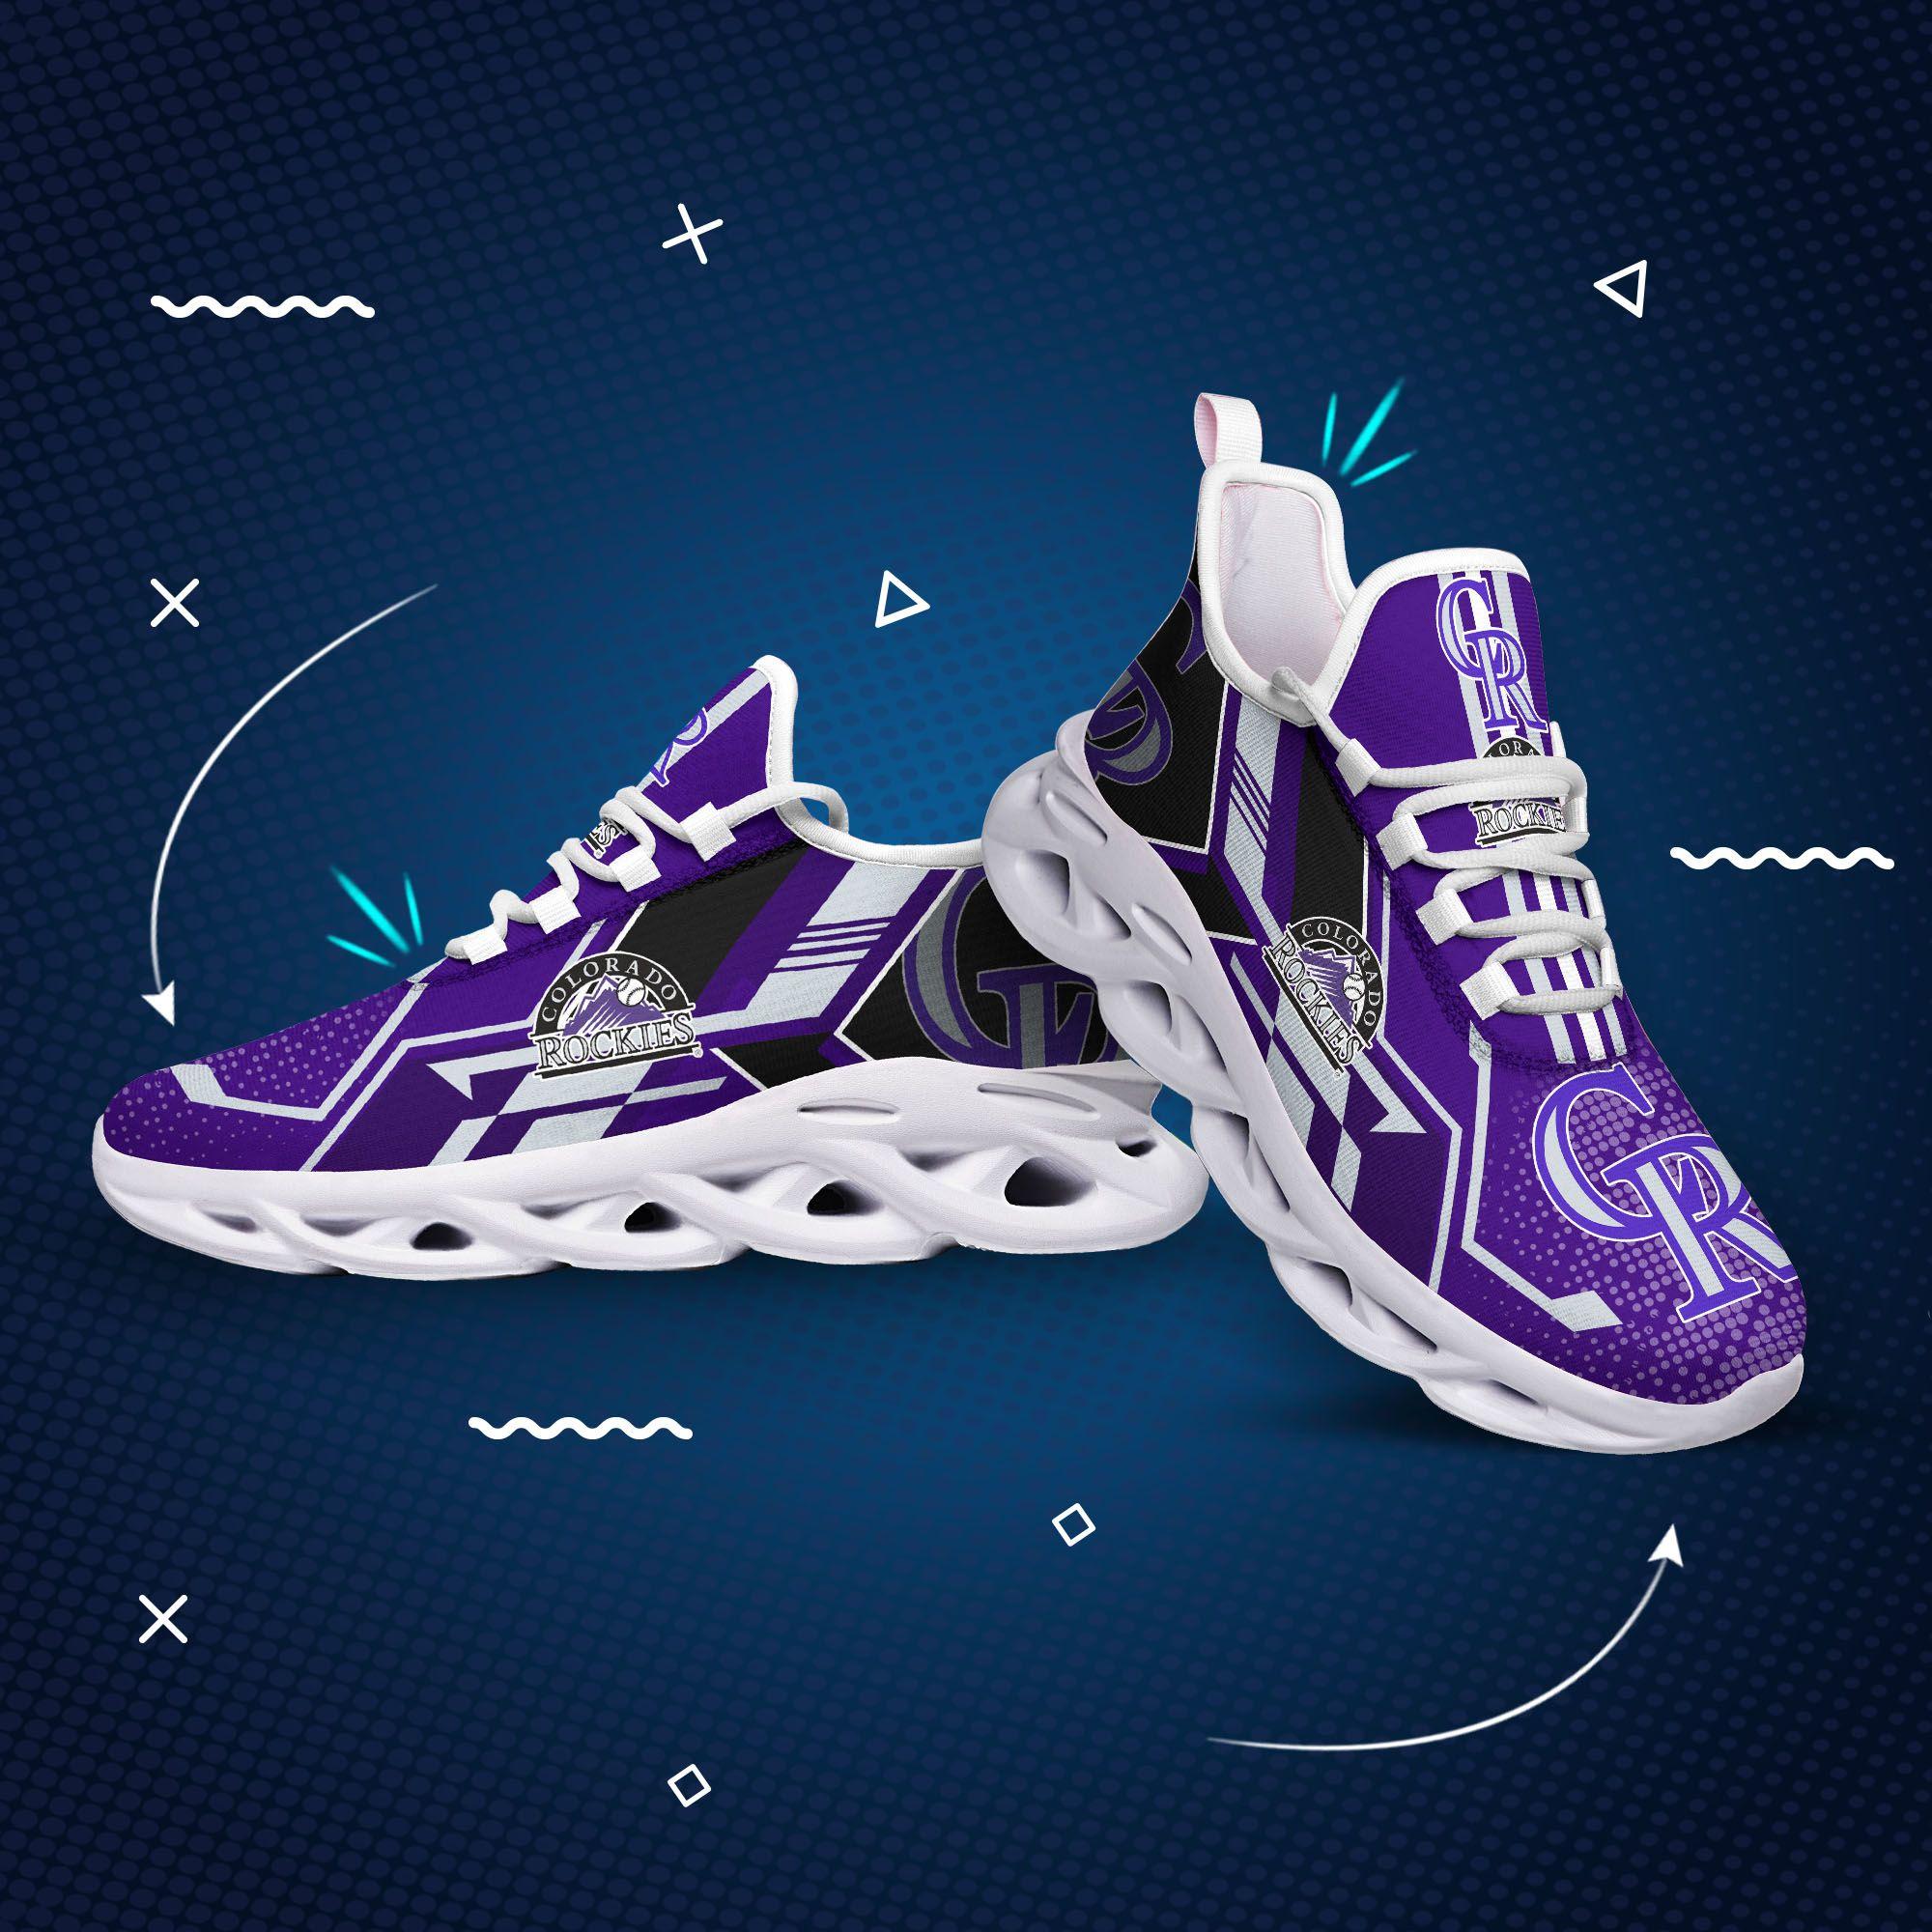 Colorado rockies mlb max soul clunky shoes 2